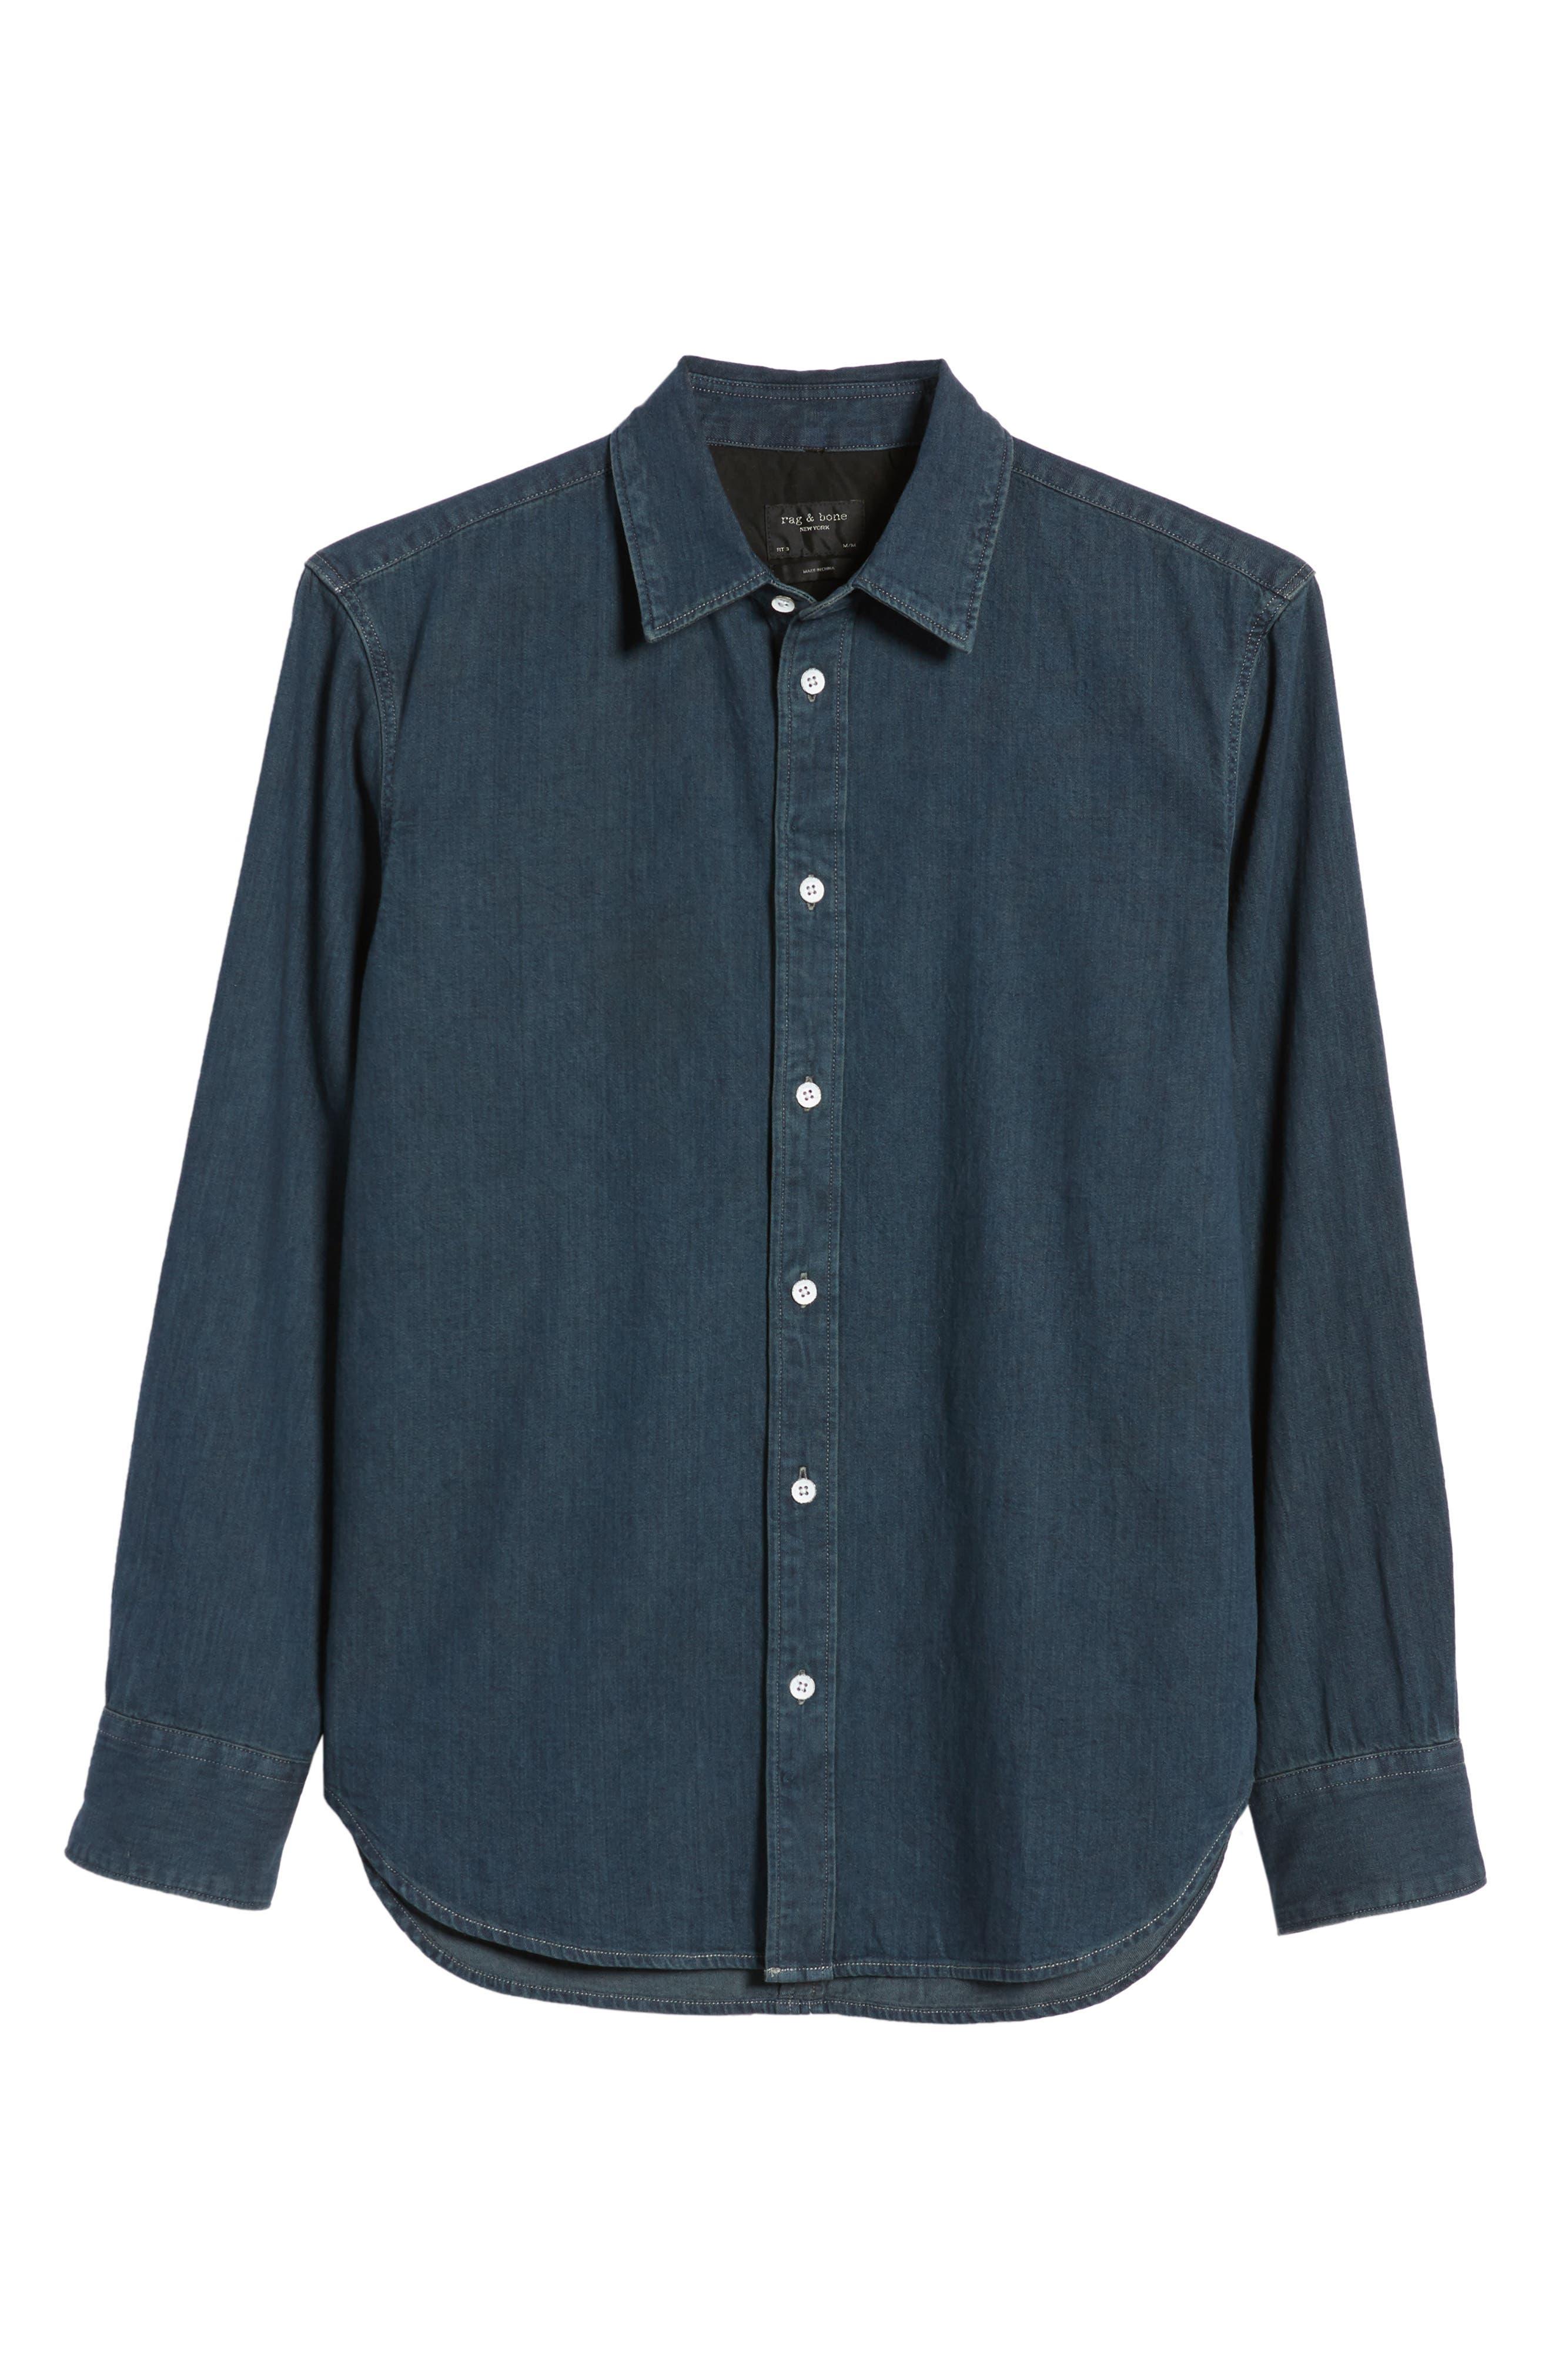 RAG & BONE,                             Fit 3 Denim Sport Shirt,                             Alternate thumbnail 5, color,                             STONE BLUE